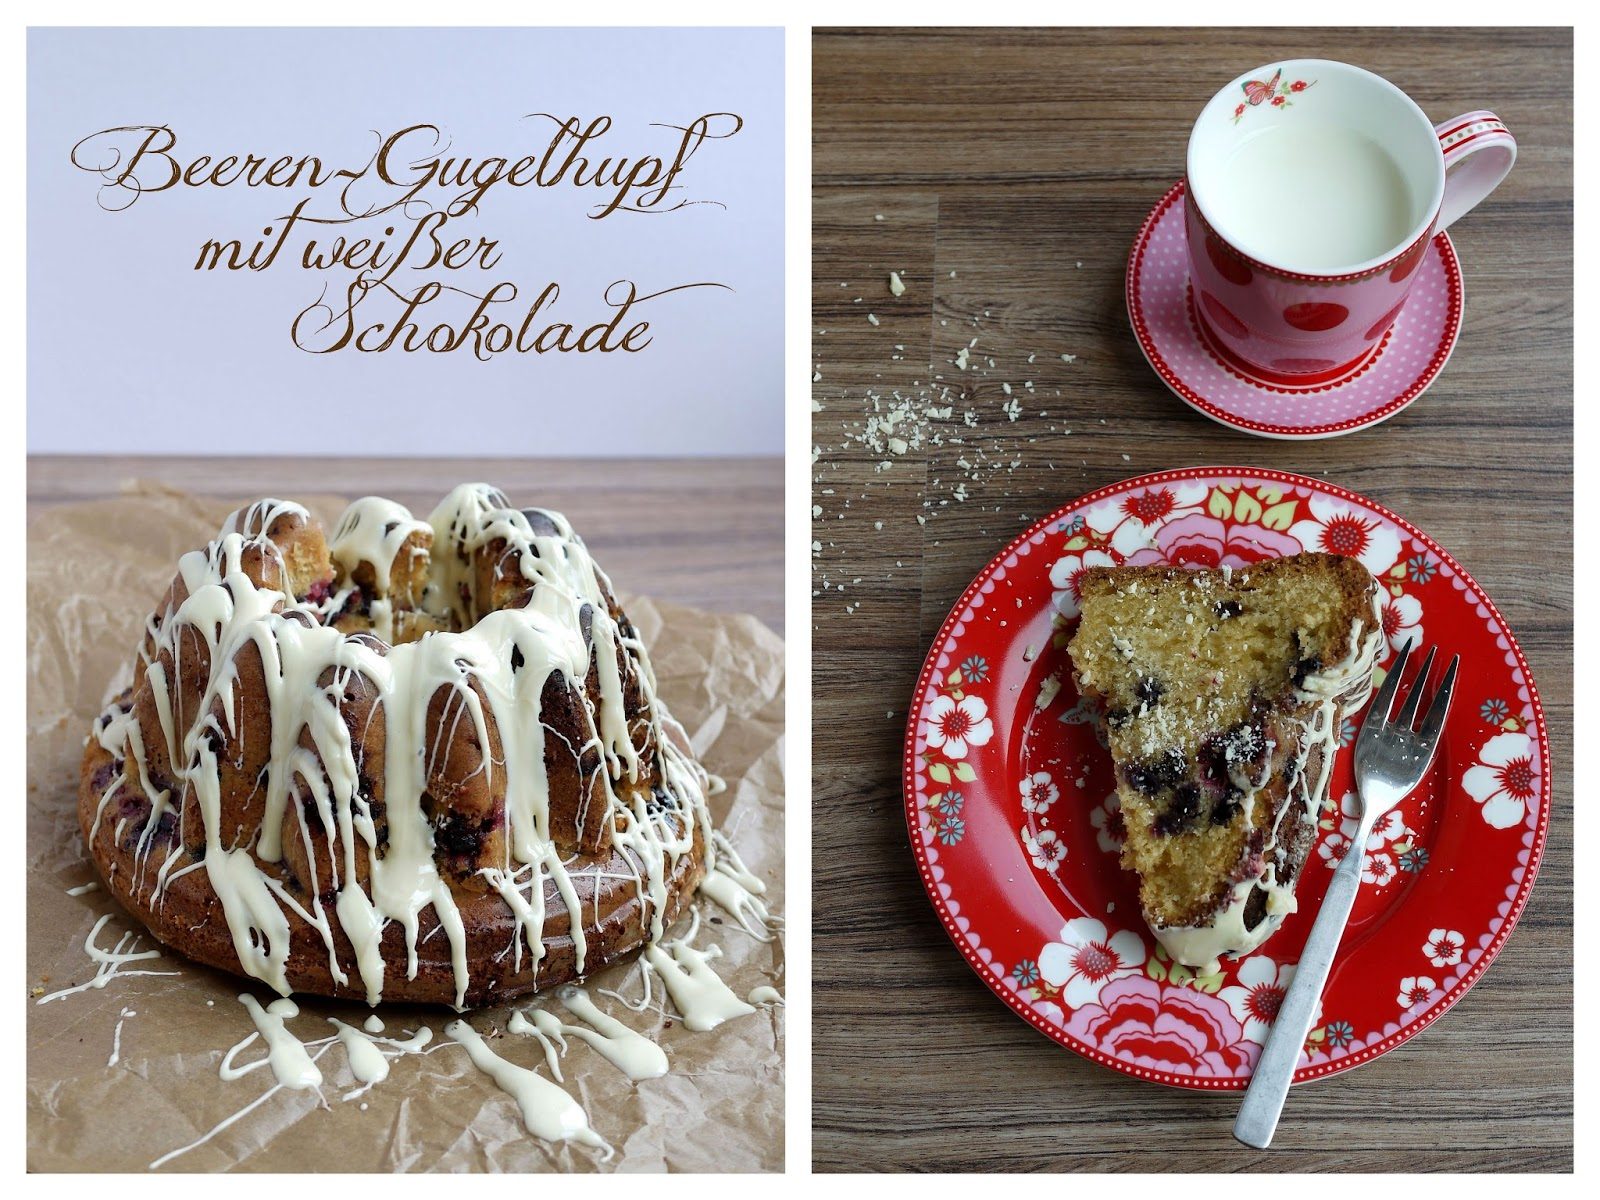 Beeren-Gugelhupf mit weißer Schokolade | Backen | Kuchen | Rezept